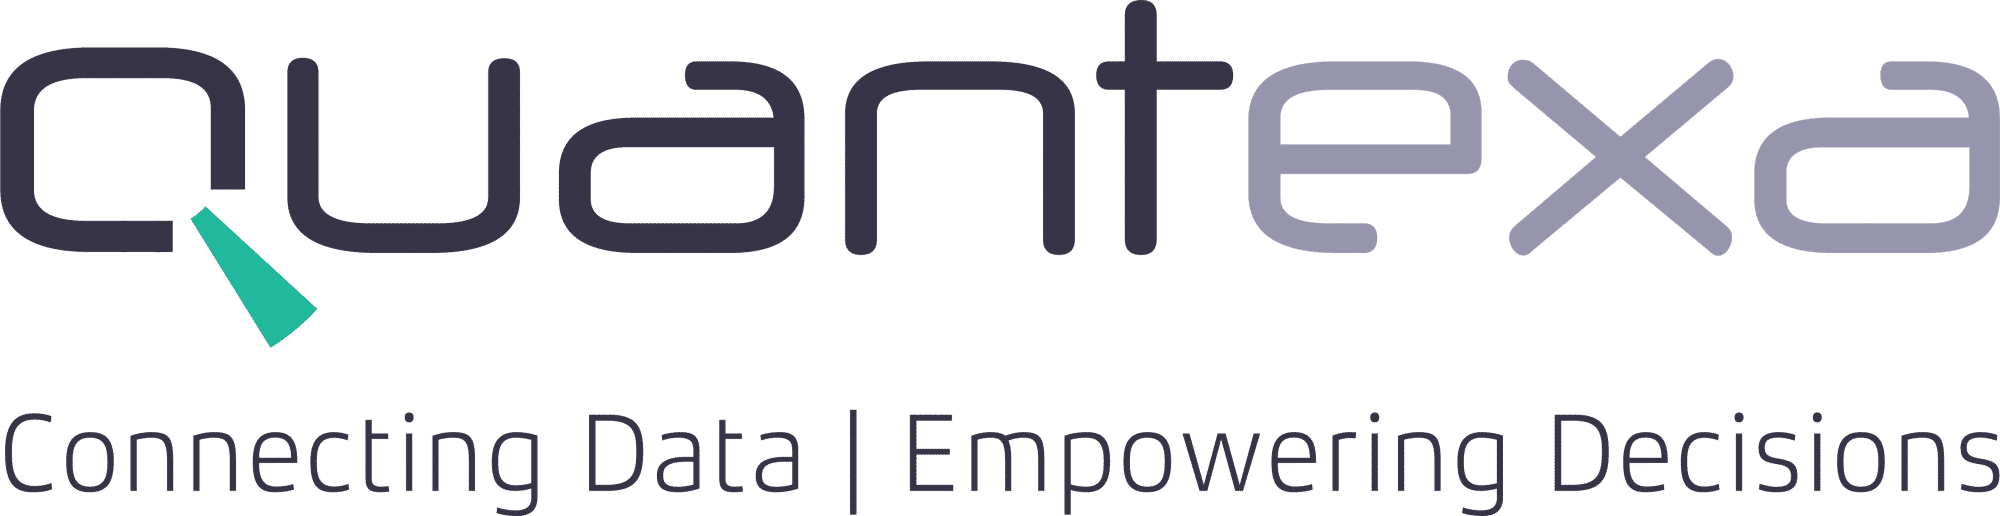 Quantexa logo_zsah